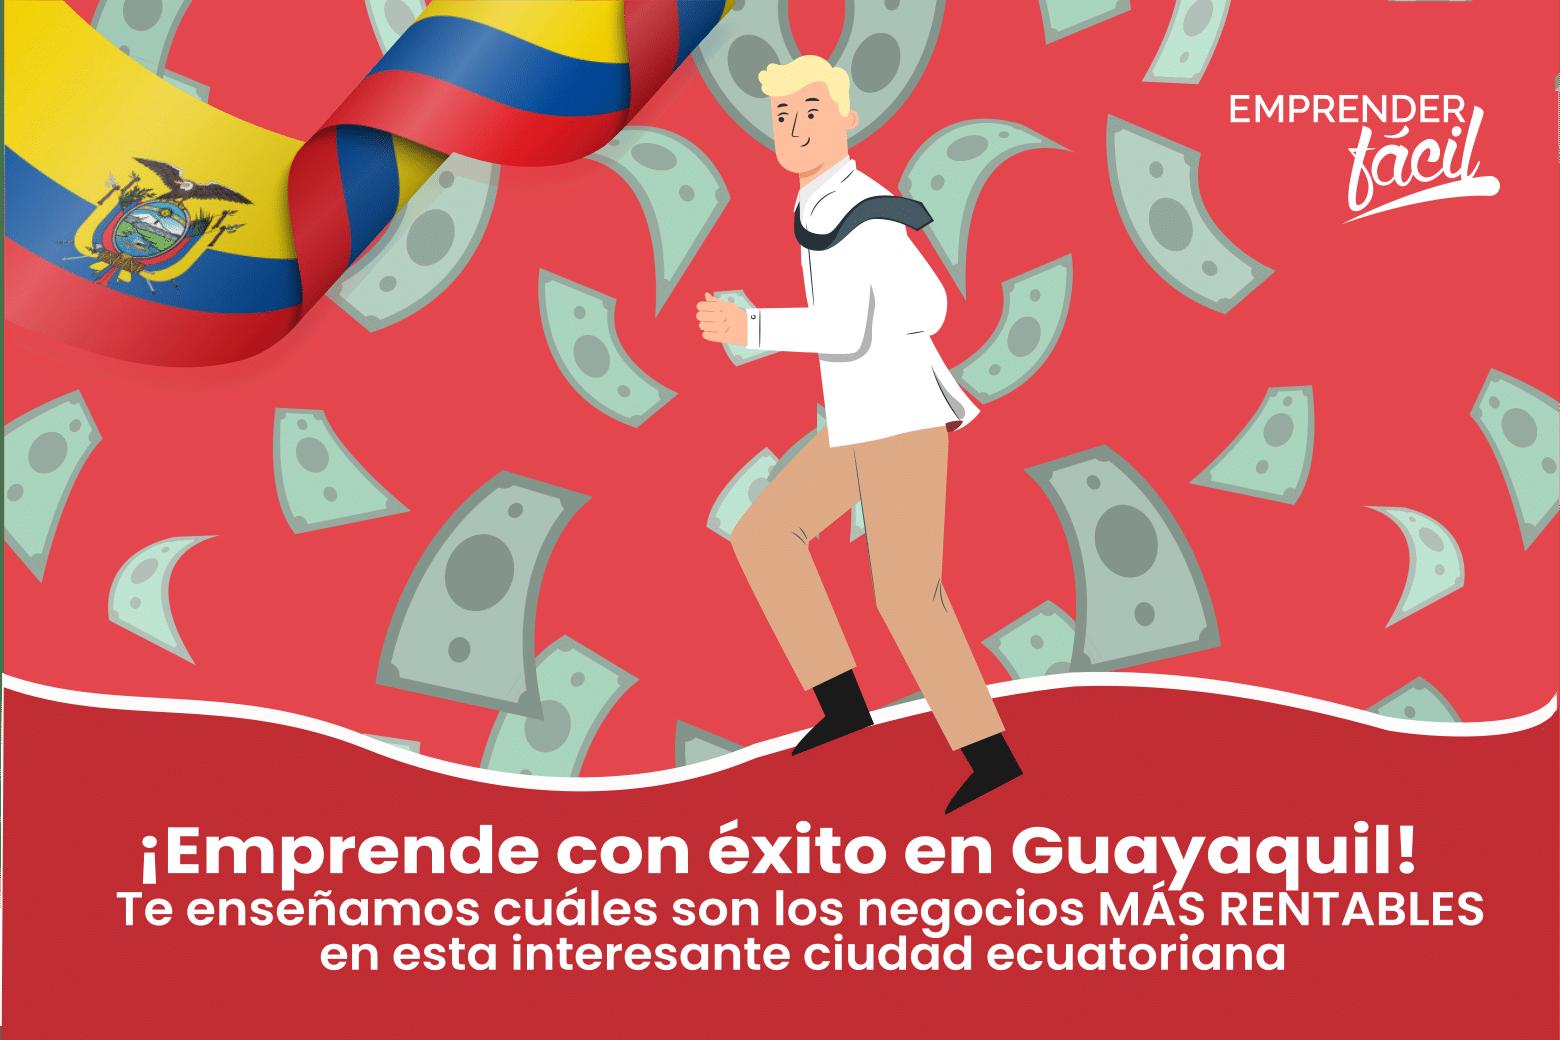 Negocios rentables en Guayaquil, Ecuador ¡Es ideal!